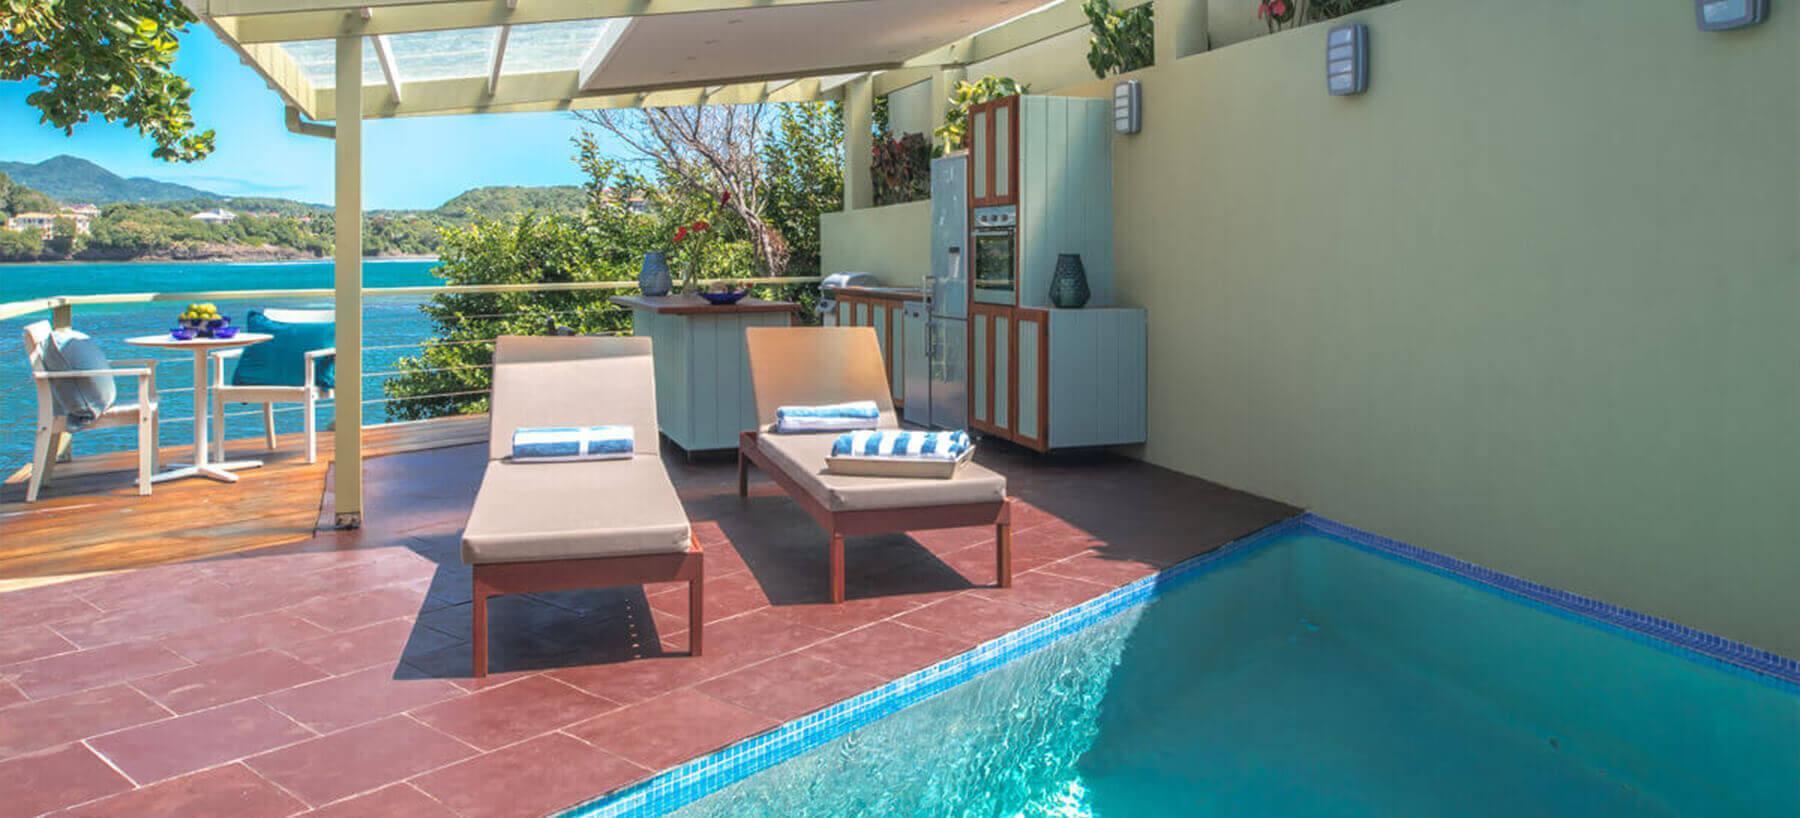 Luxury villa in Grenada with private pool